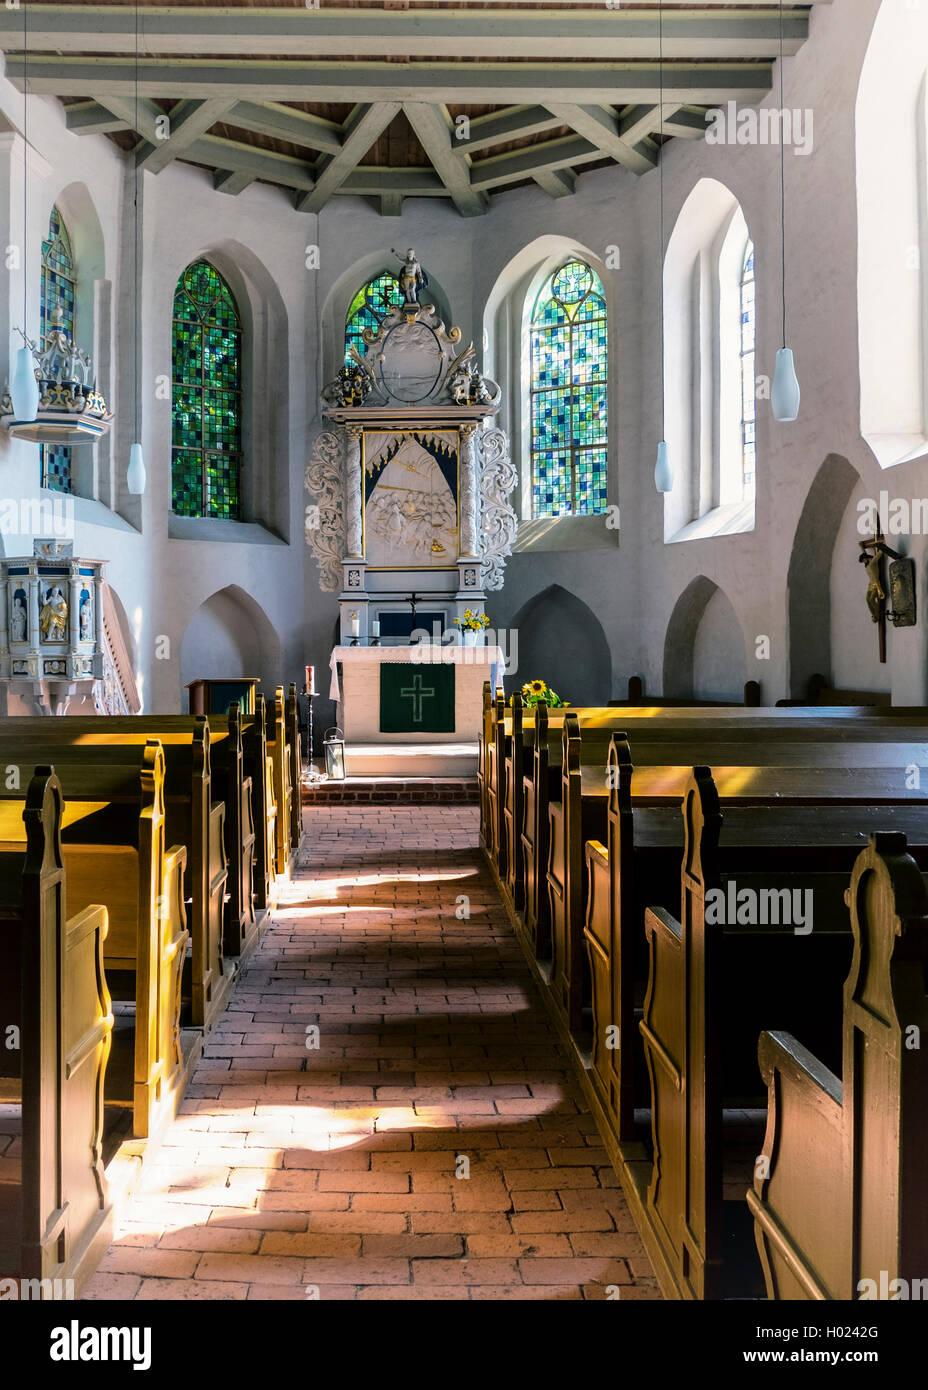 Klosterkirche Protestant Parish Church building interior,  Himmelpfort (Heaven's Gate), Brandenburg, Germany - Stock Image